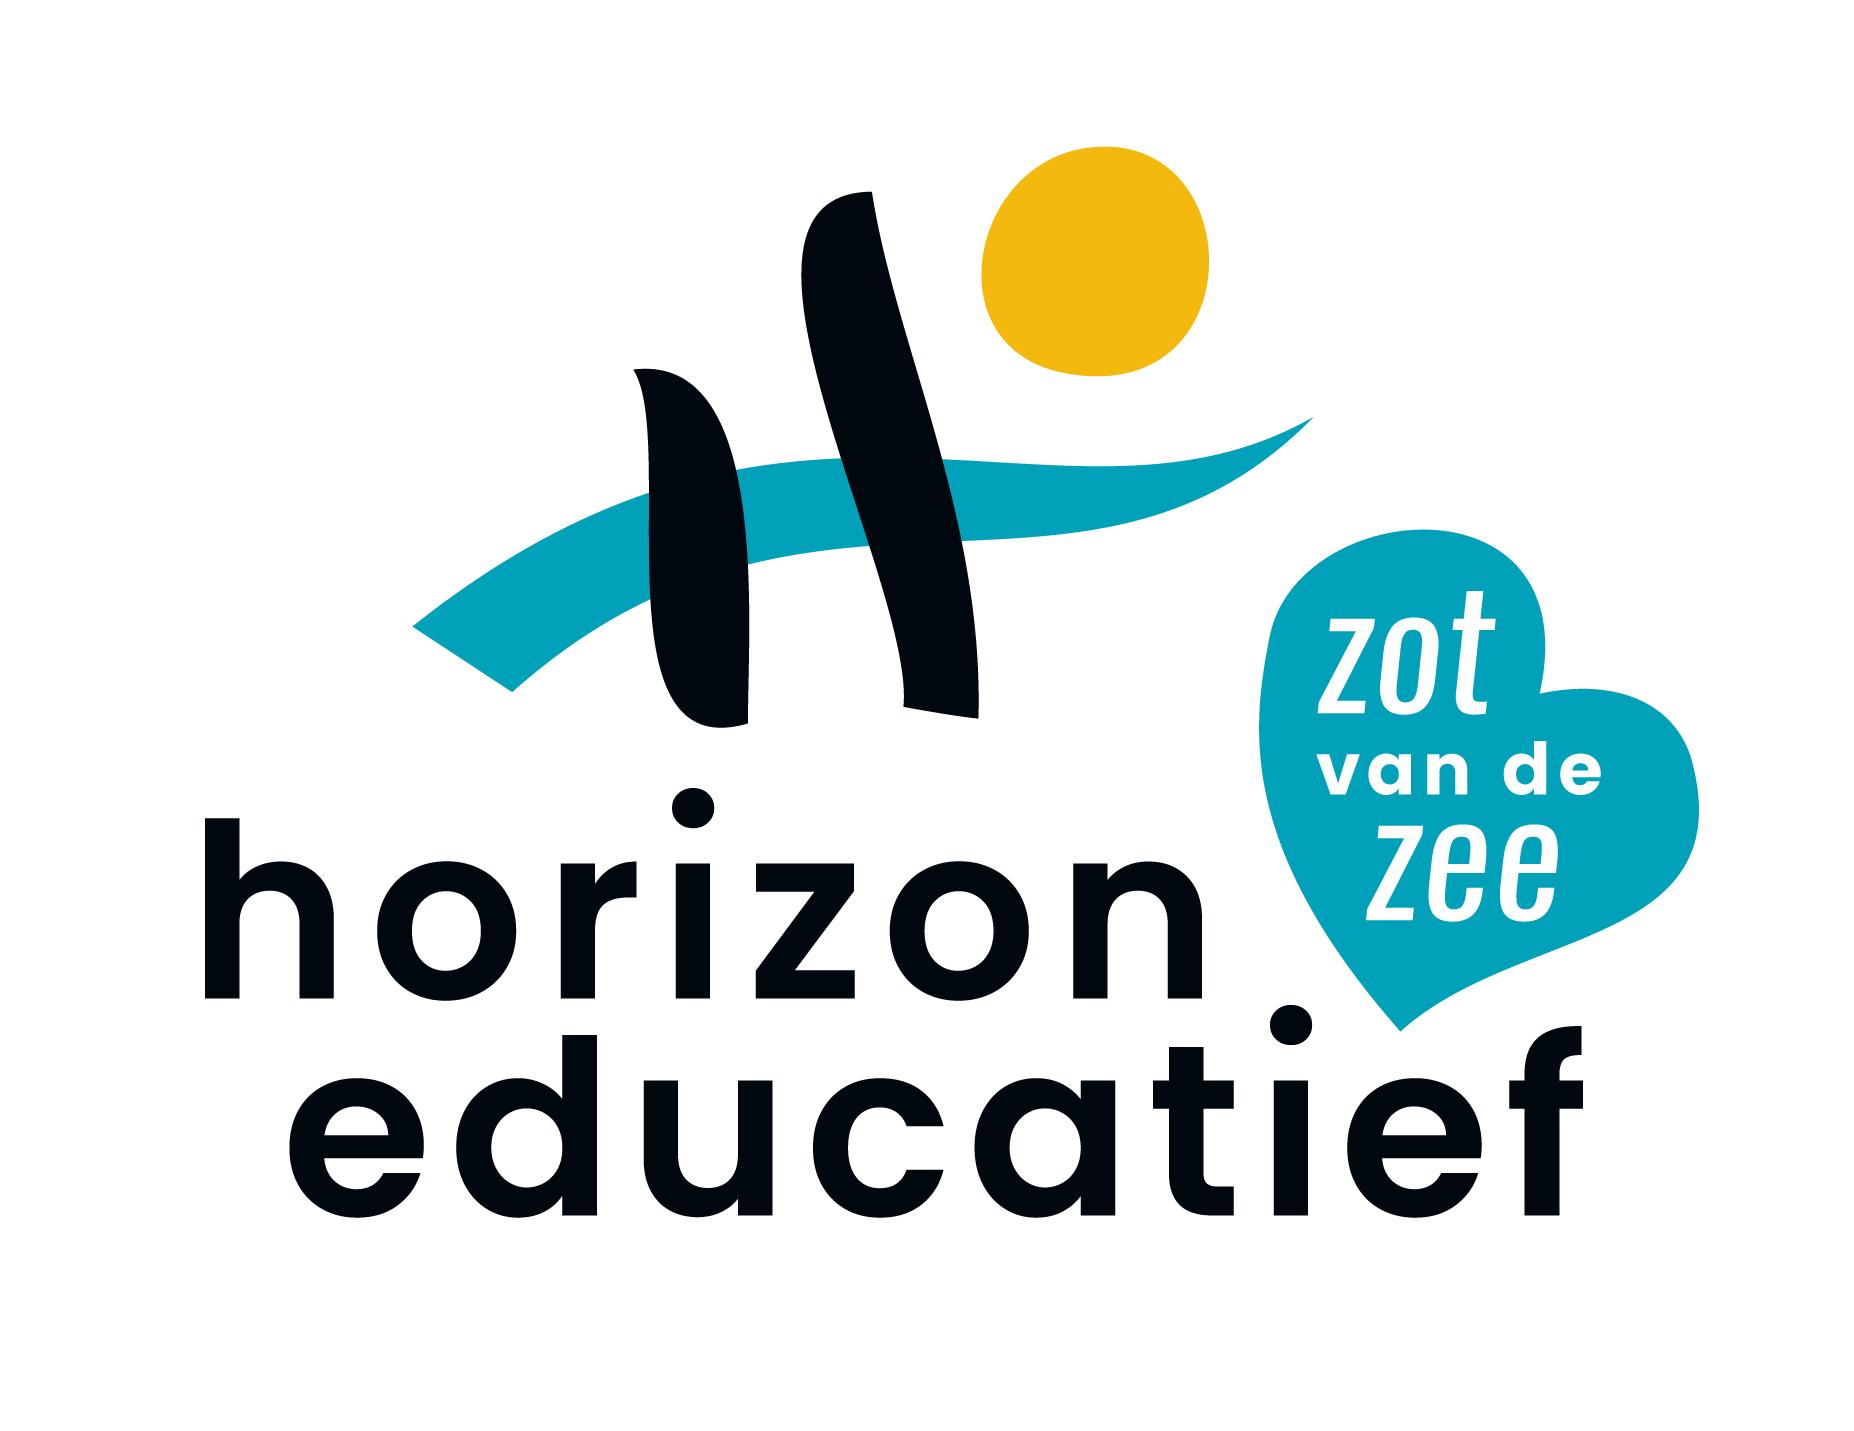 Horizon Educatief